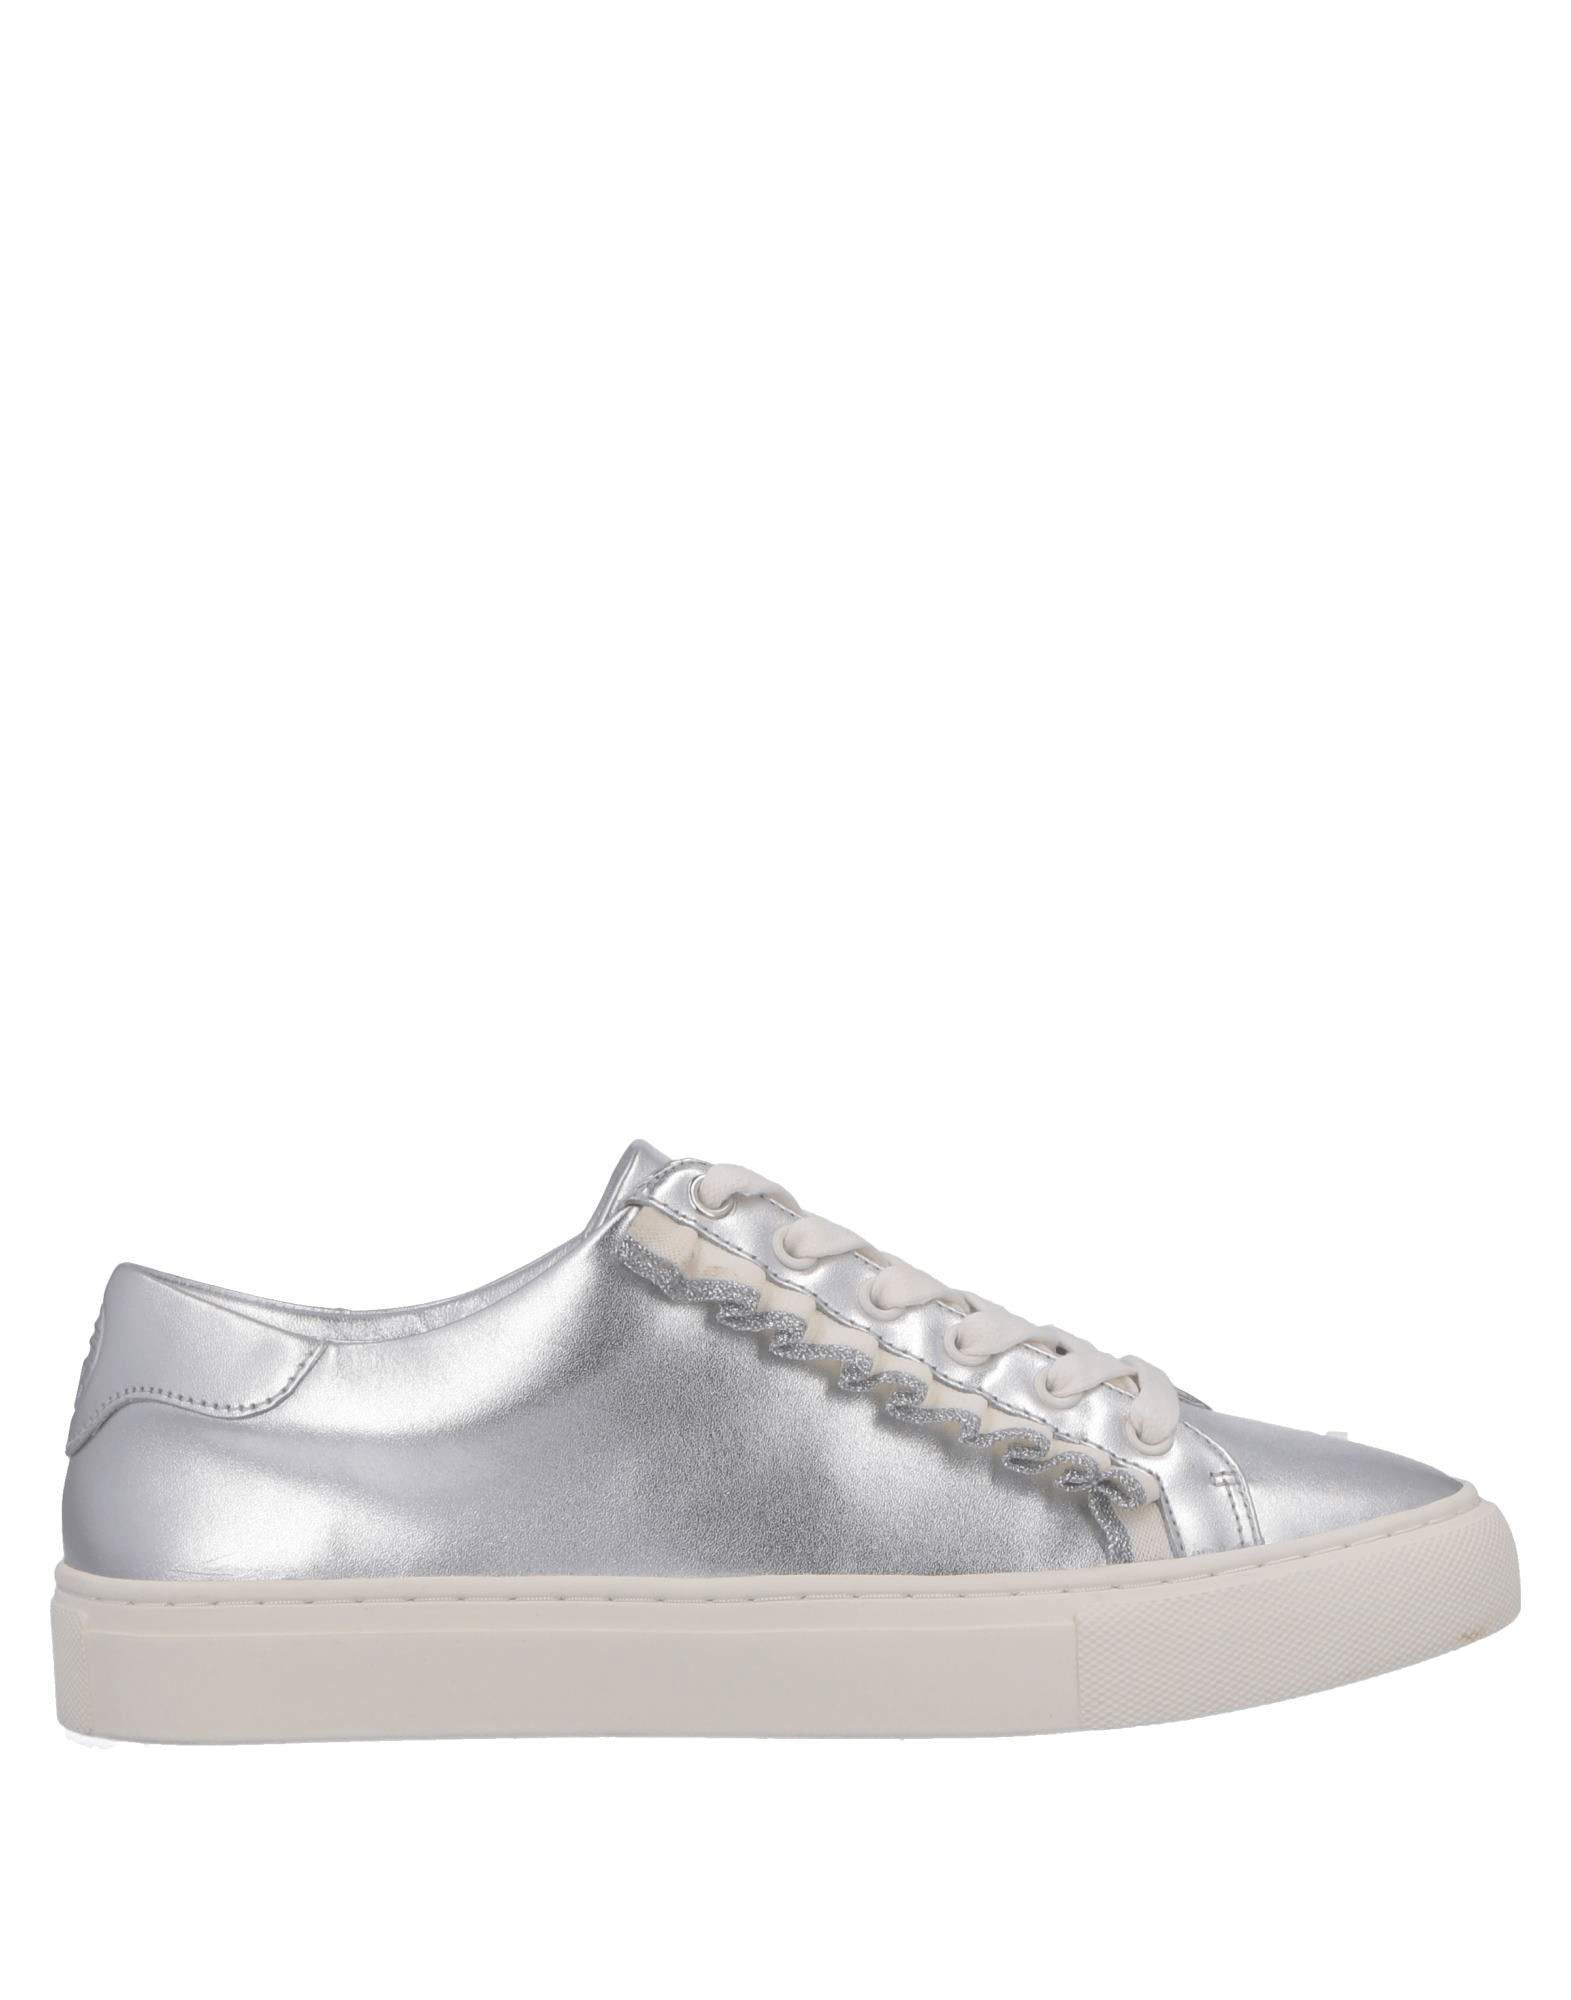 Tory Sport Sneakers In Silver | ModeSens